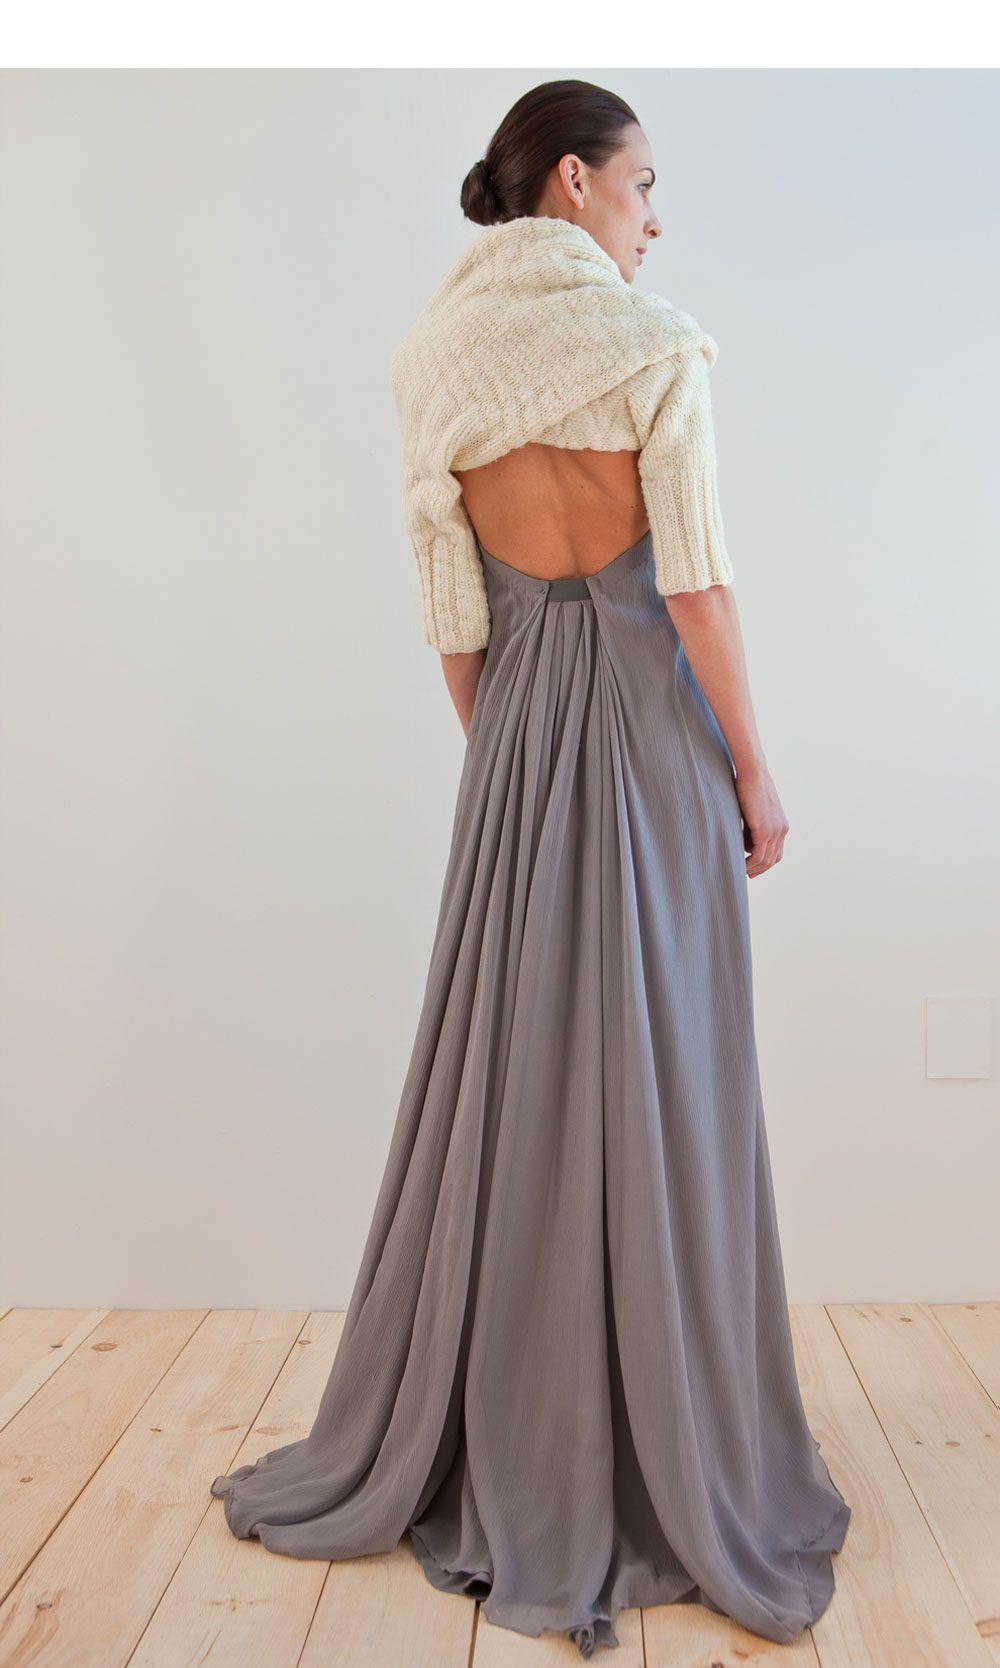 NFP    felted silk halter gown  http://nfpstudio.com/lookbook/series-5-fw2011/look-r/